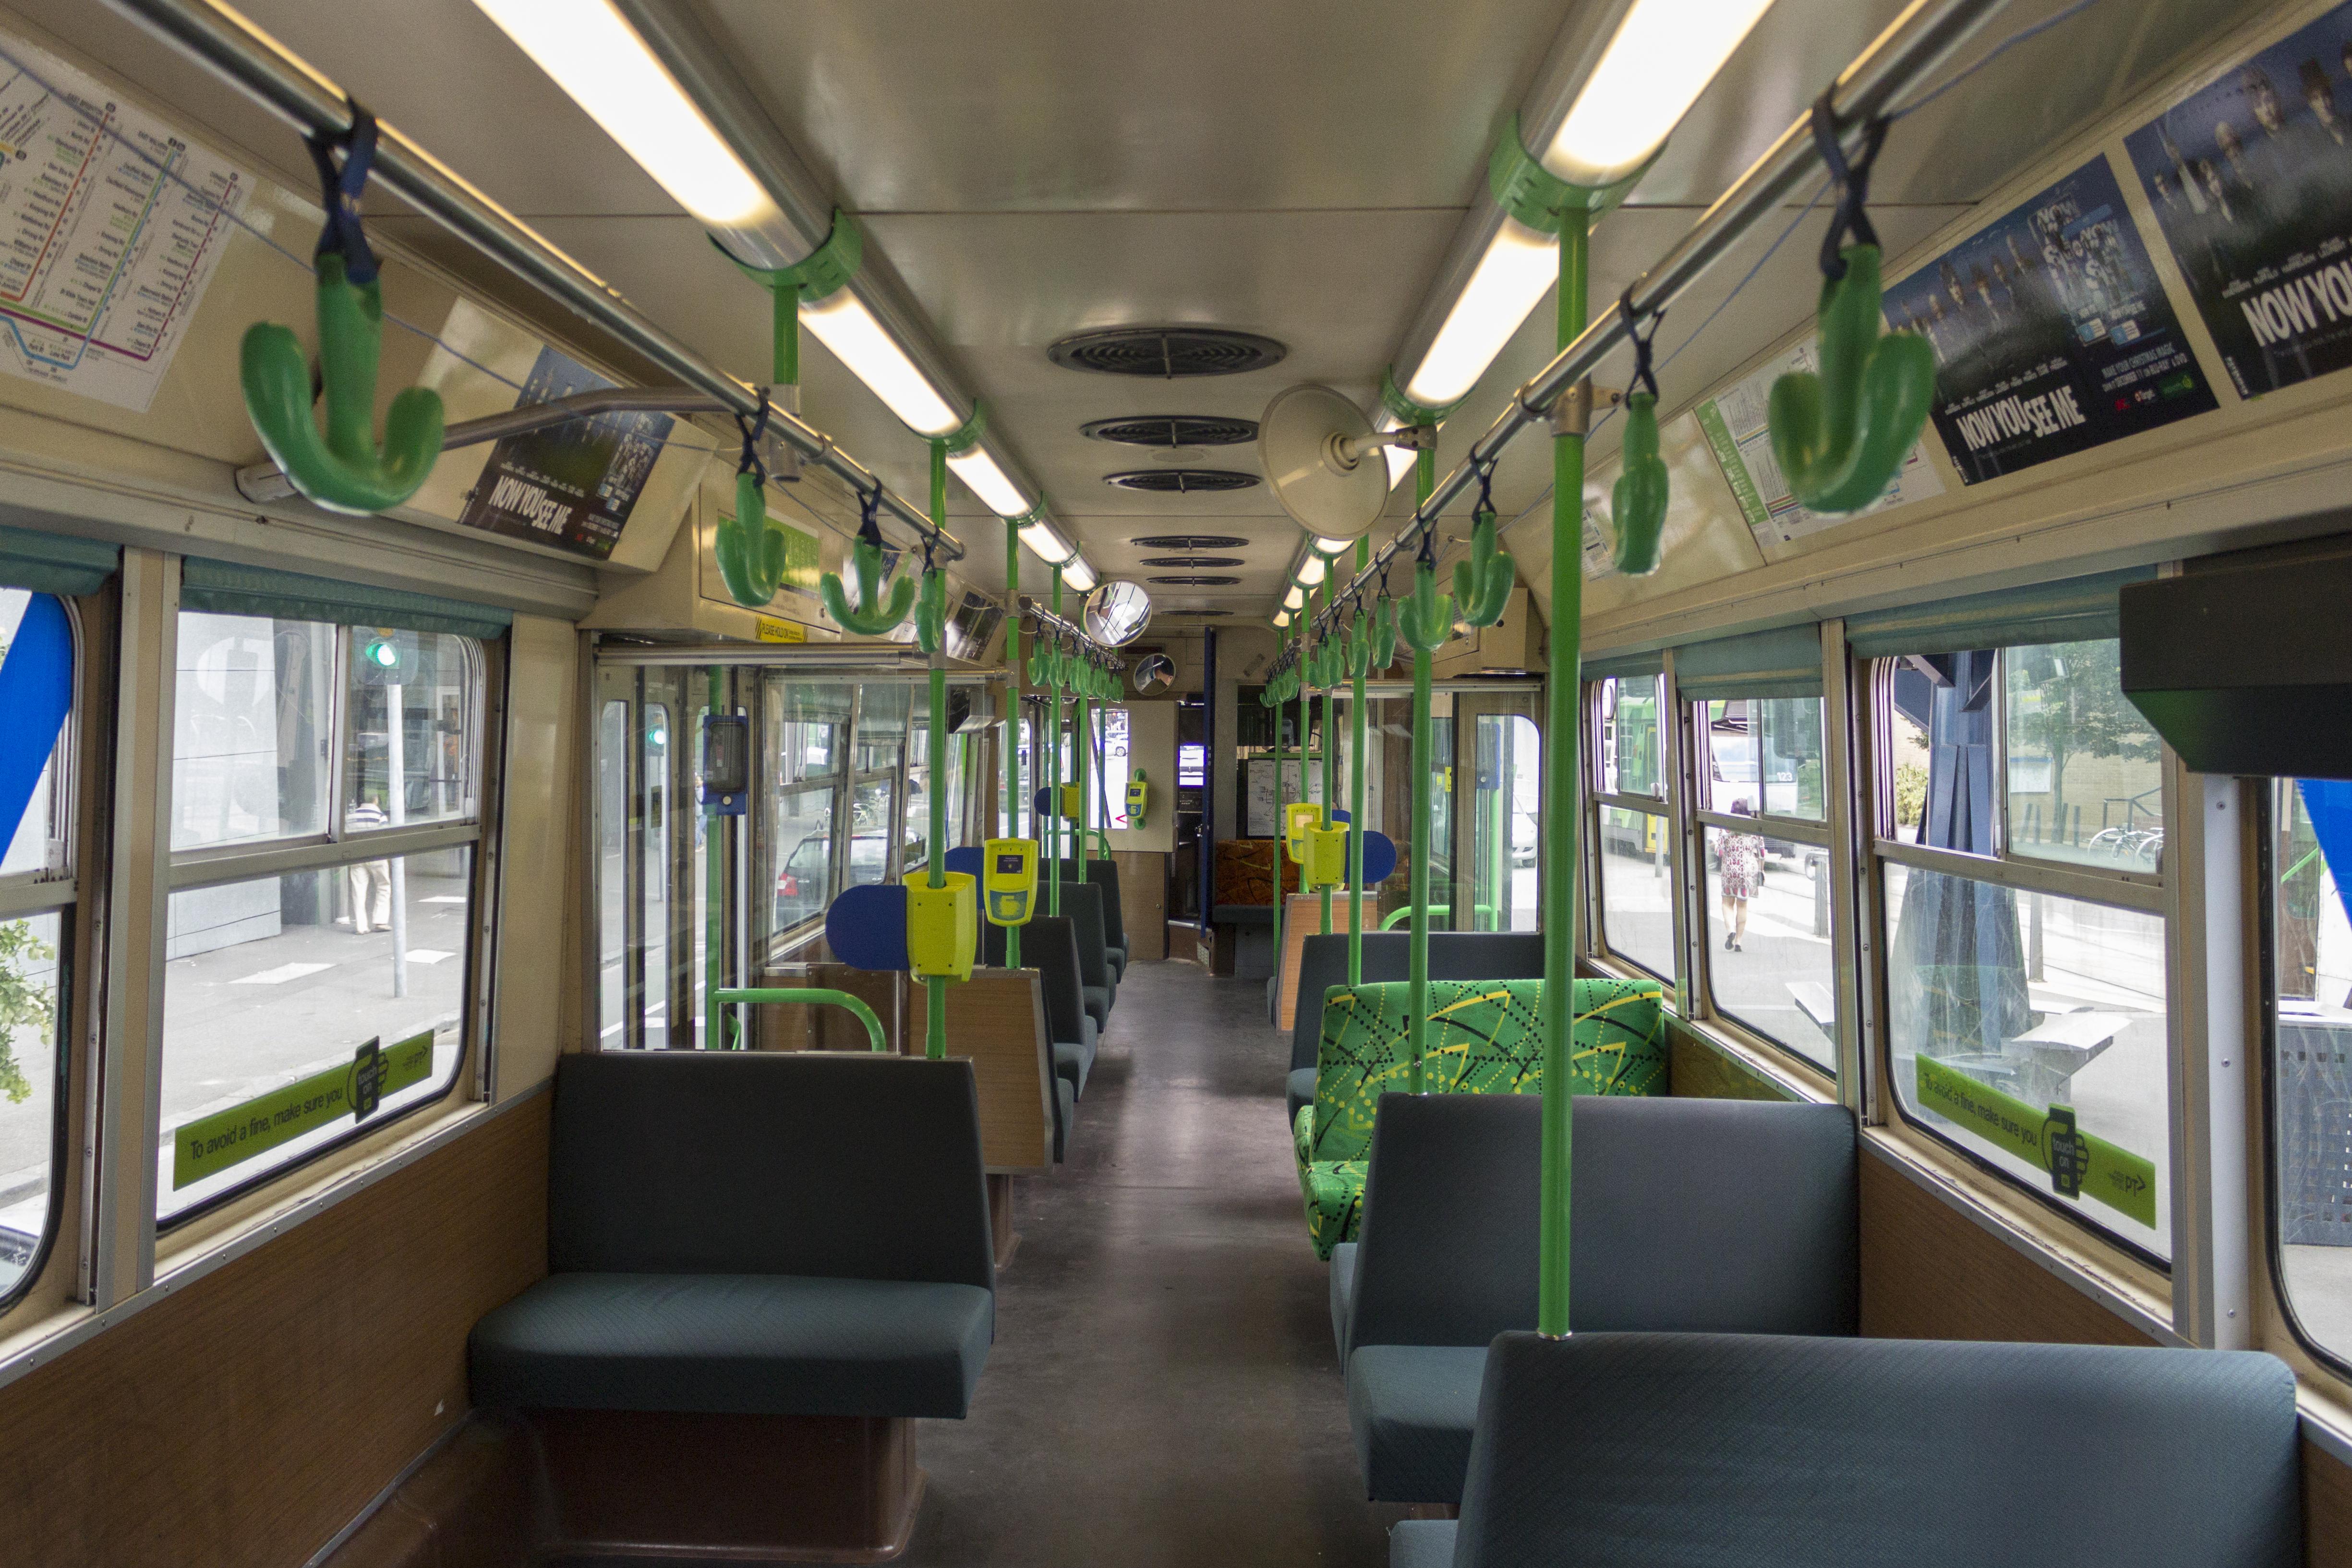 FileZ1 Class Melbourne Tram Interior 2013JPG